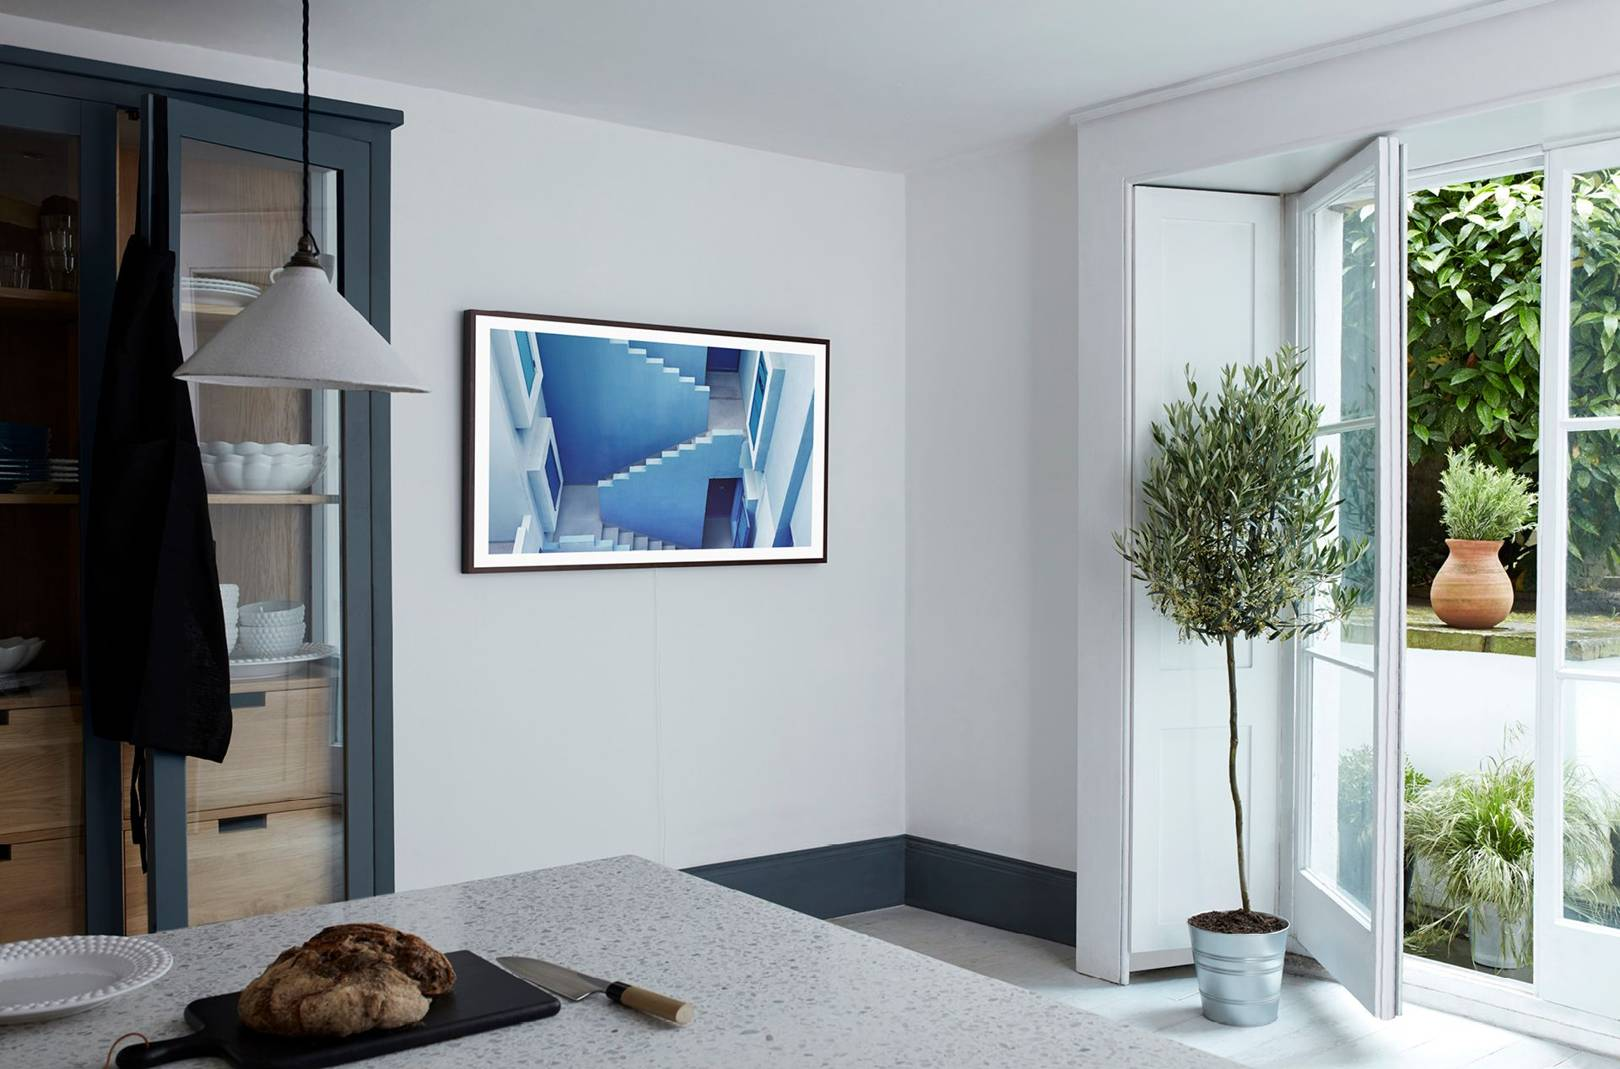 samsung frame qled and serif tvs revolutionise design british gq